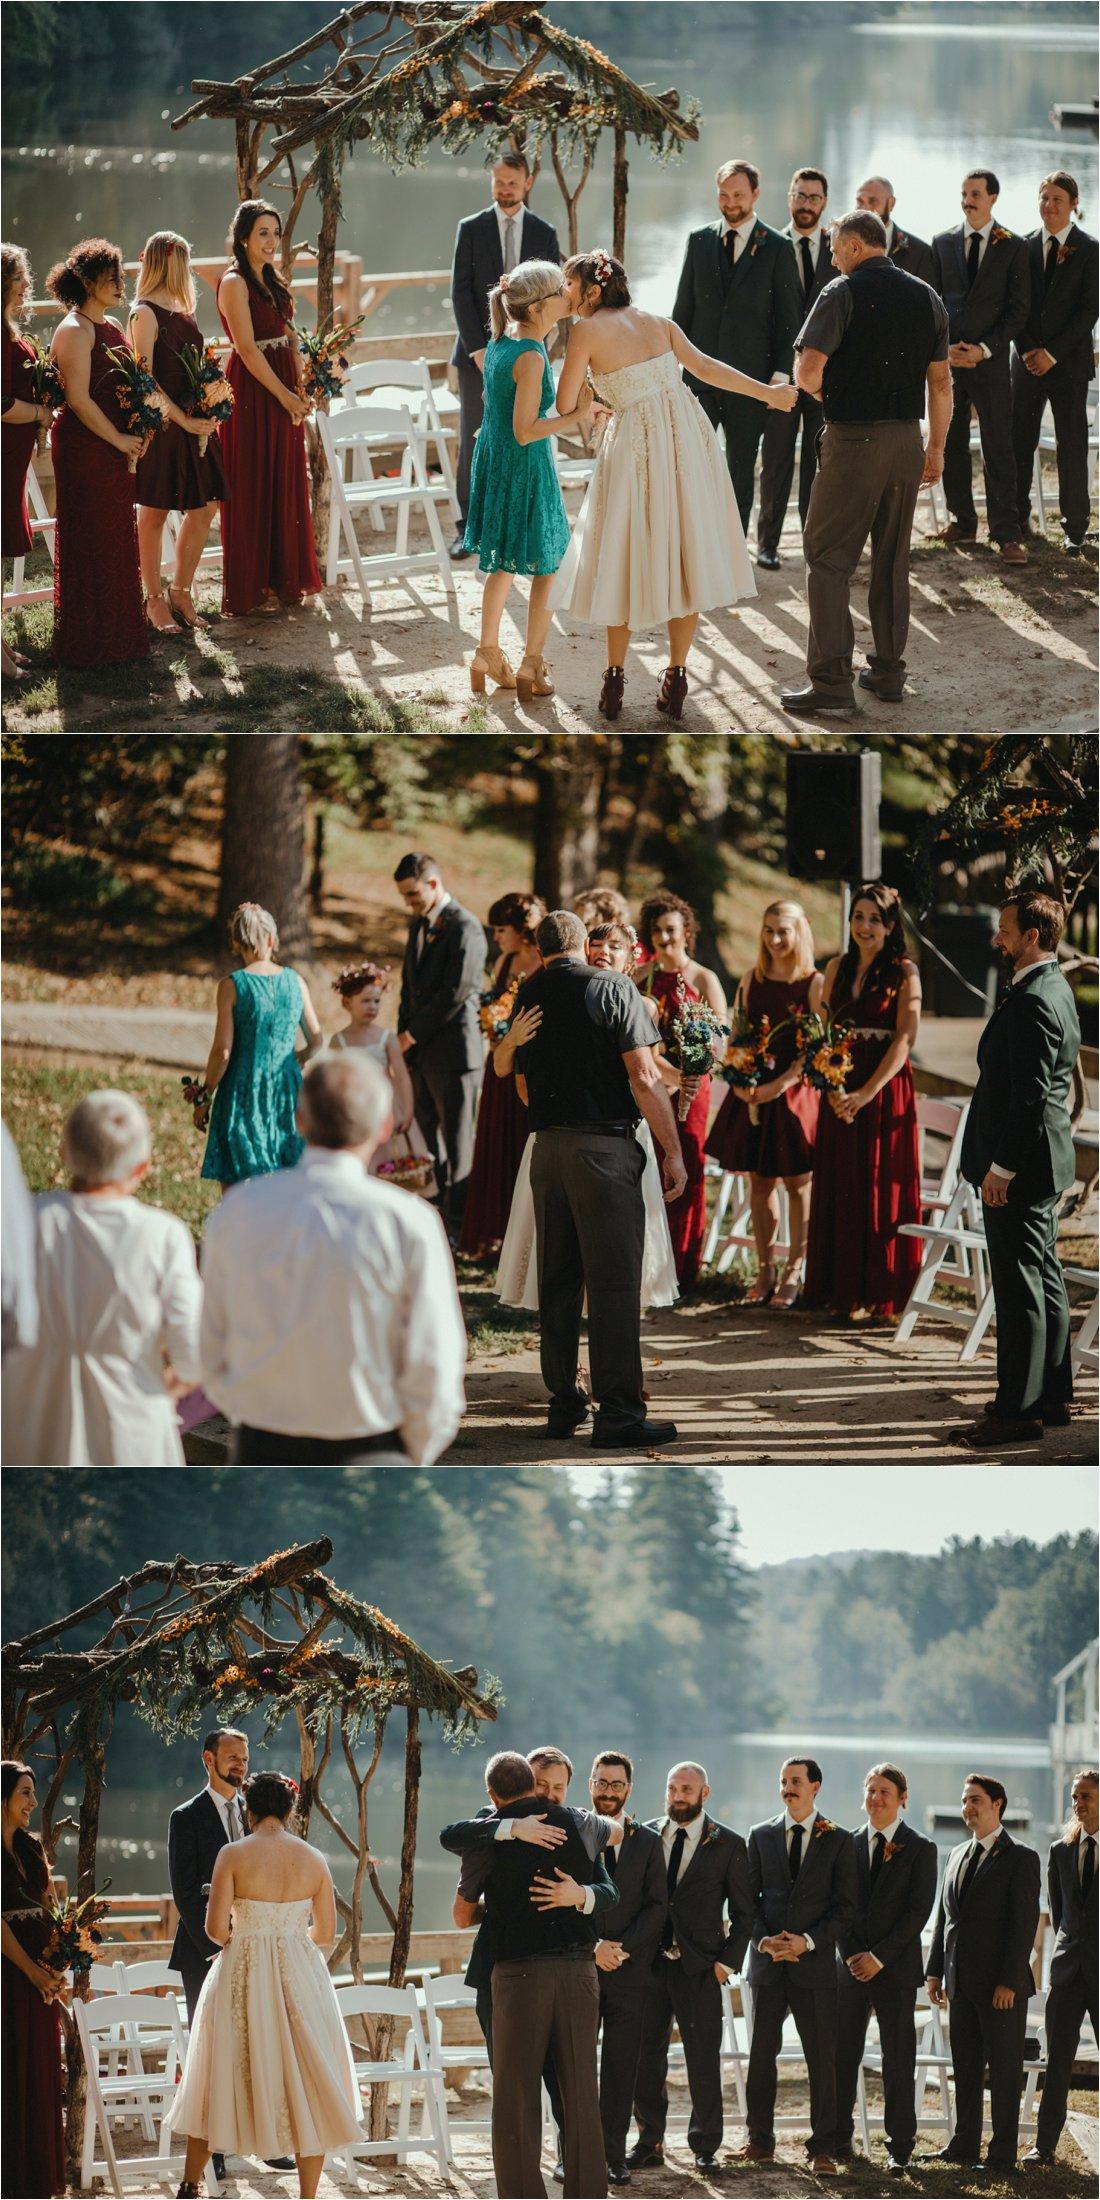 echo-oscar-camp-pinnacle-asheville-hendersonville-nc-wedding_0015.jpg